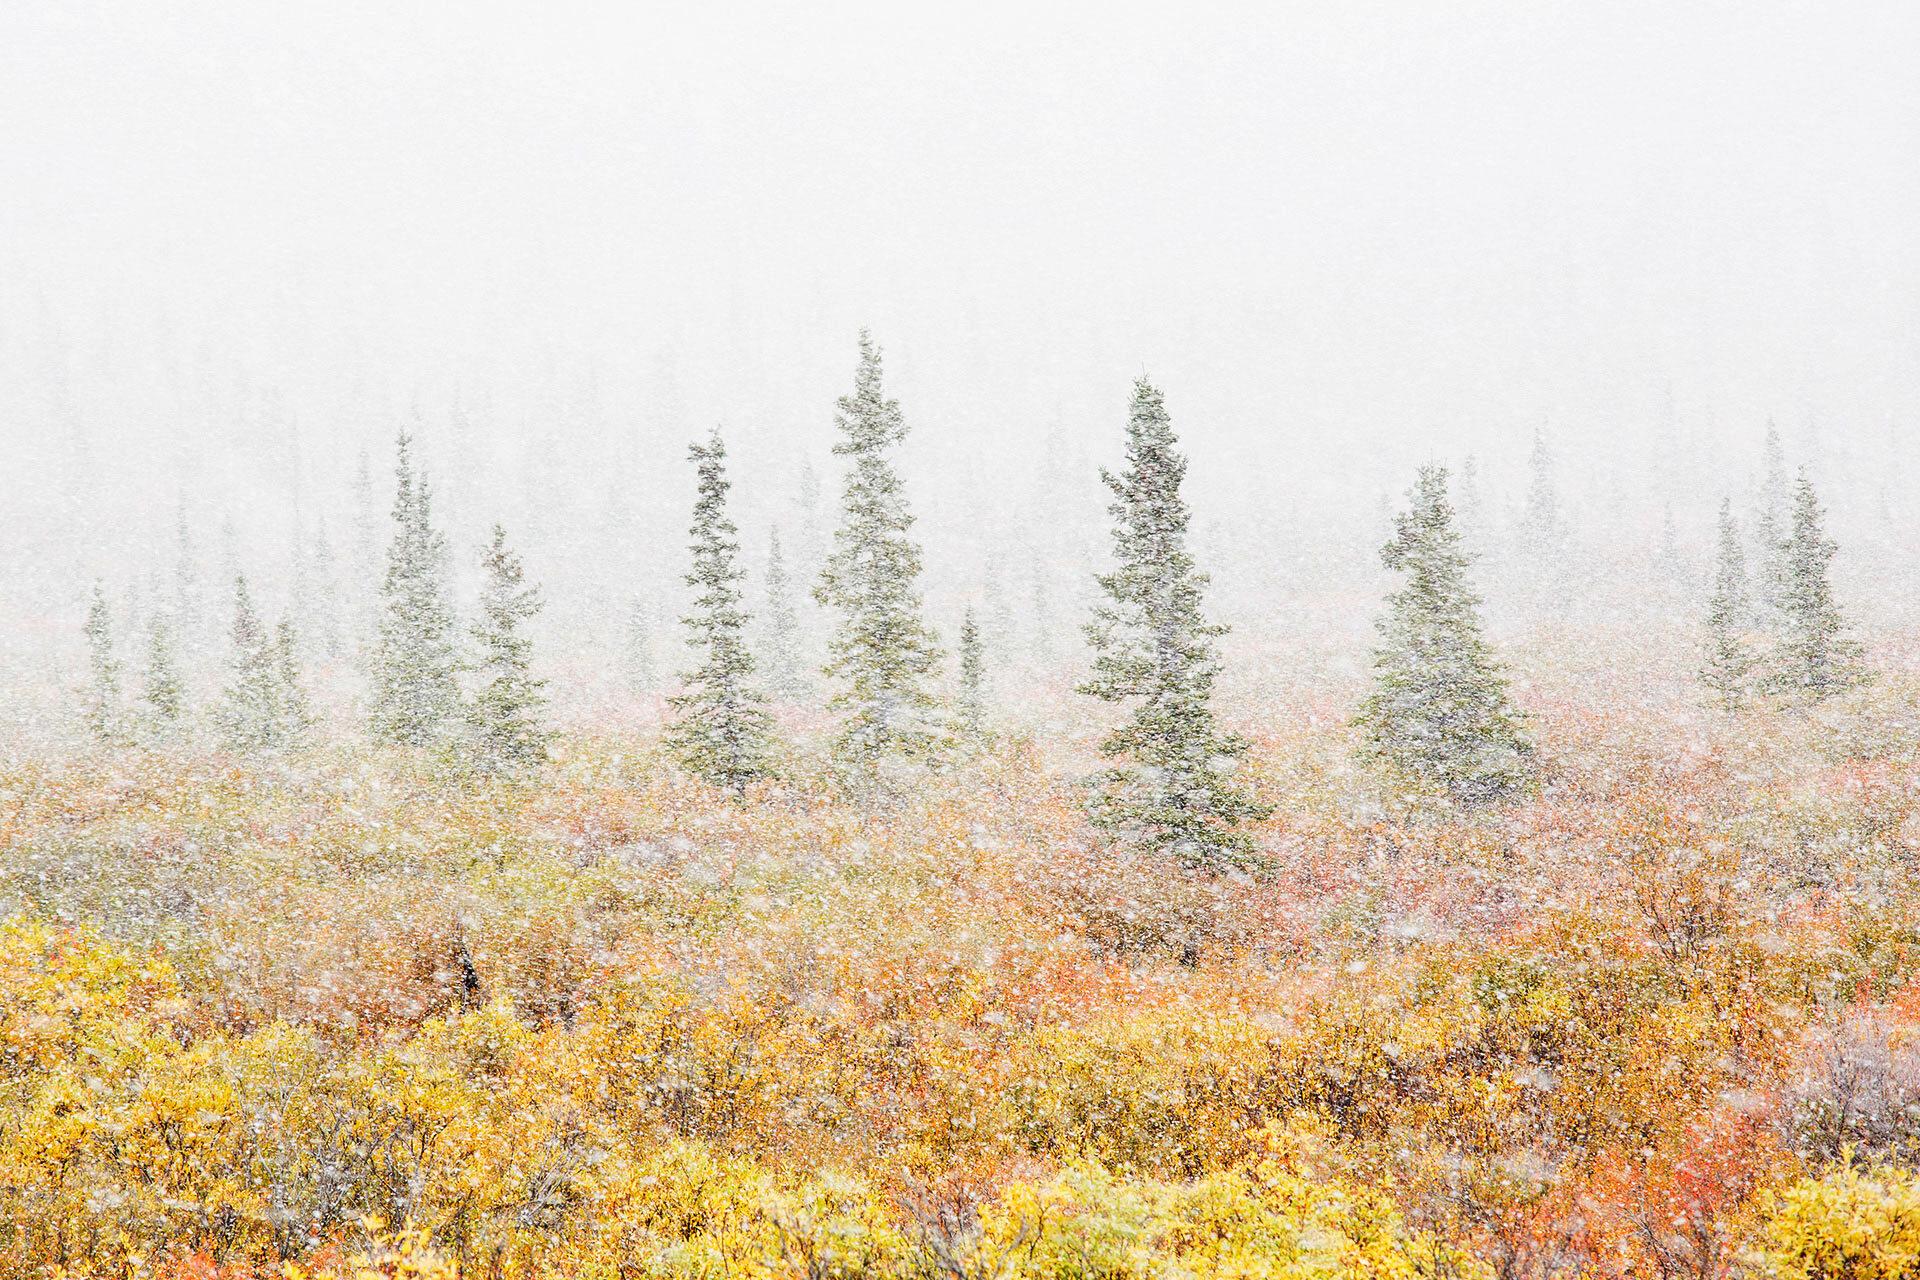 k5_alaska_autumn_blizard